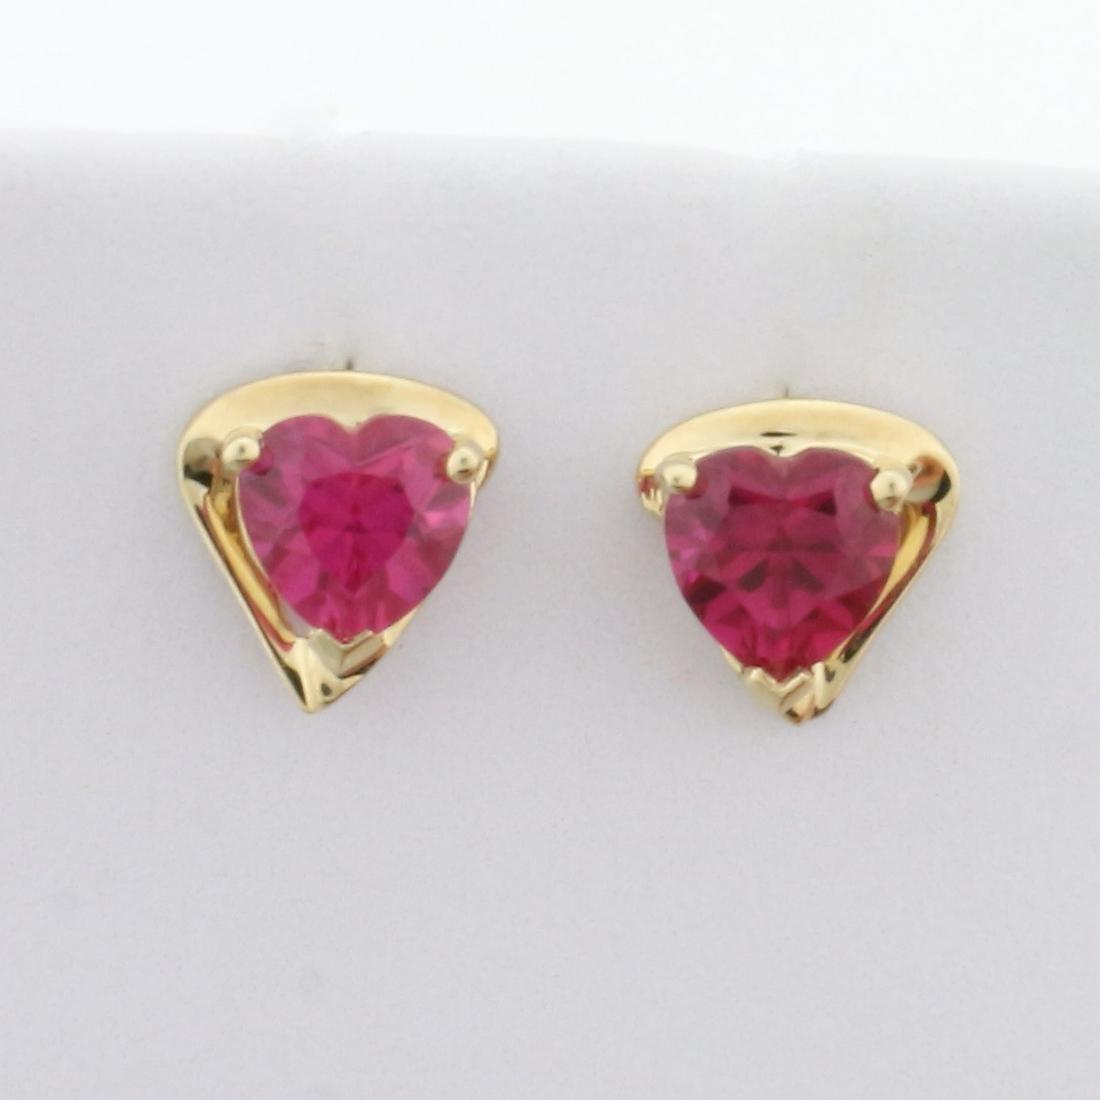 1ct TW Heart-Shaped Lab Pink Sapphire Stud Earrings in